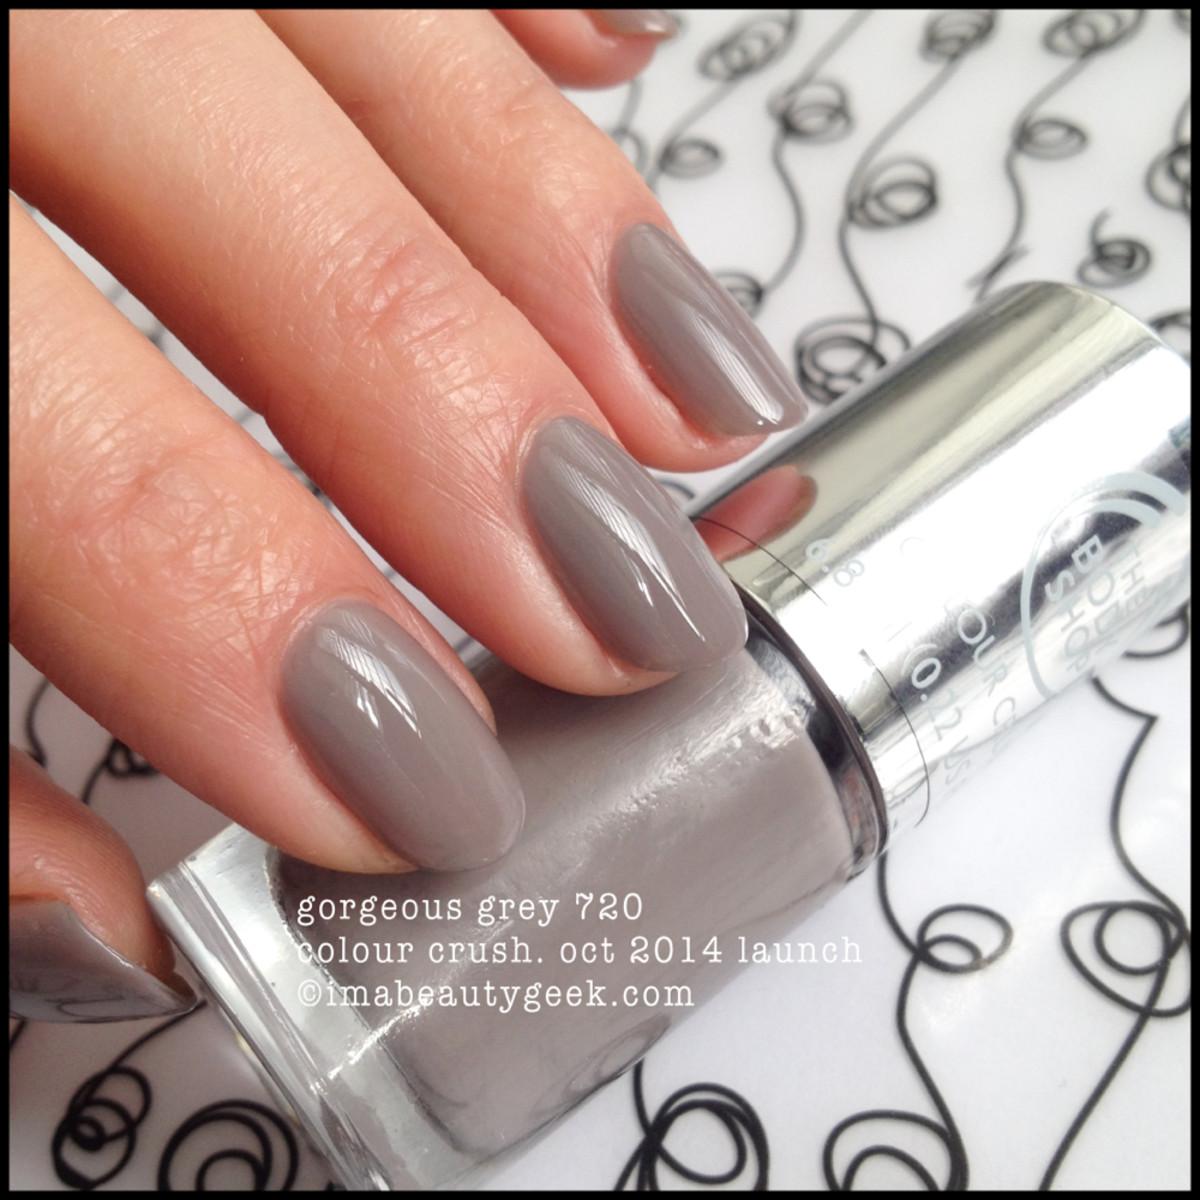 Body Shop Polish Gorgeous Grey 720 Colour Crush